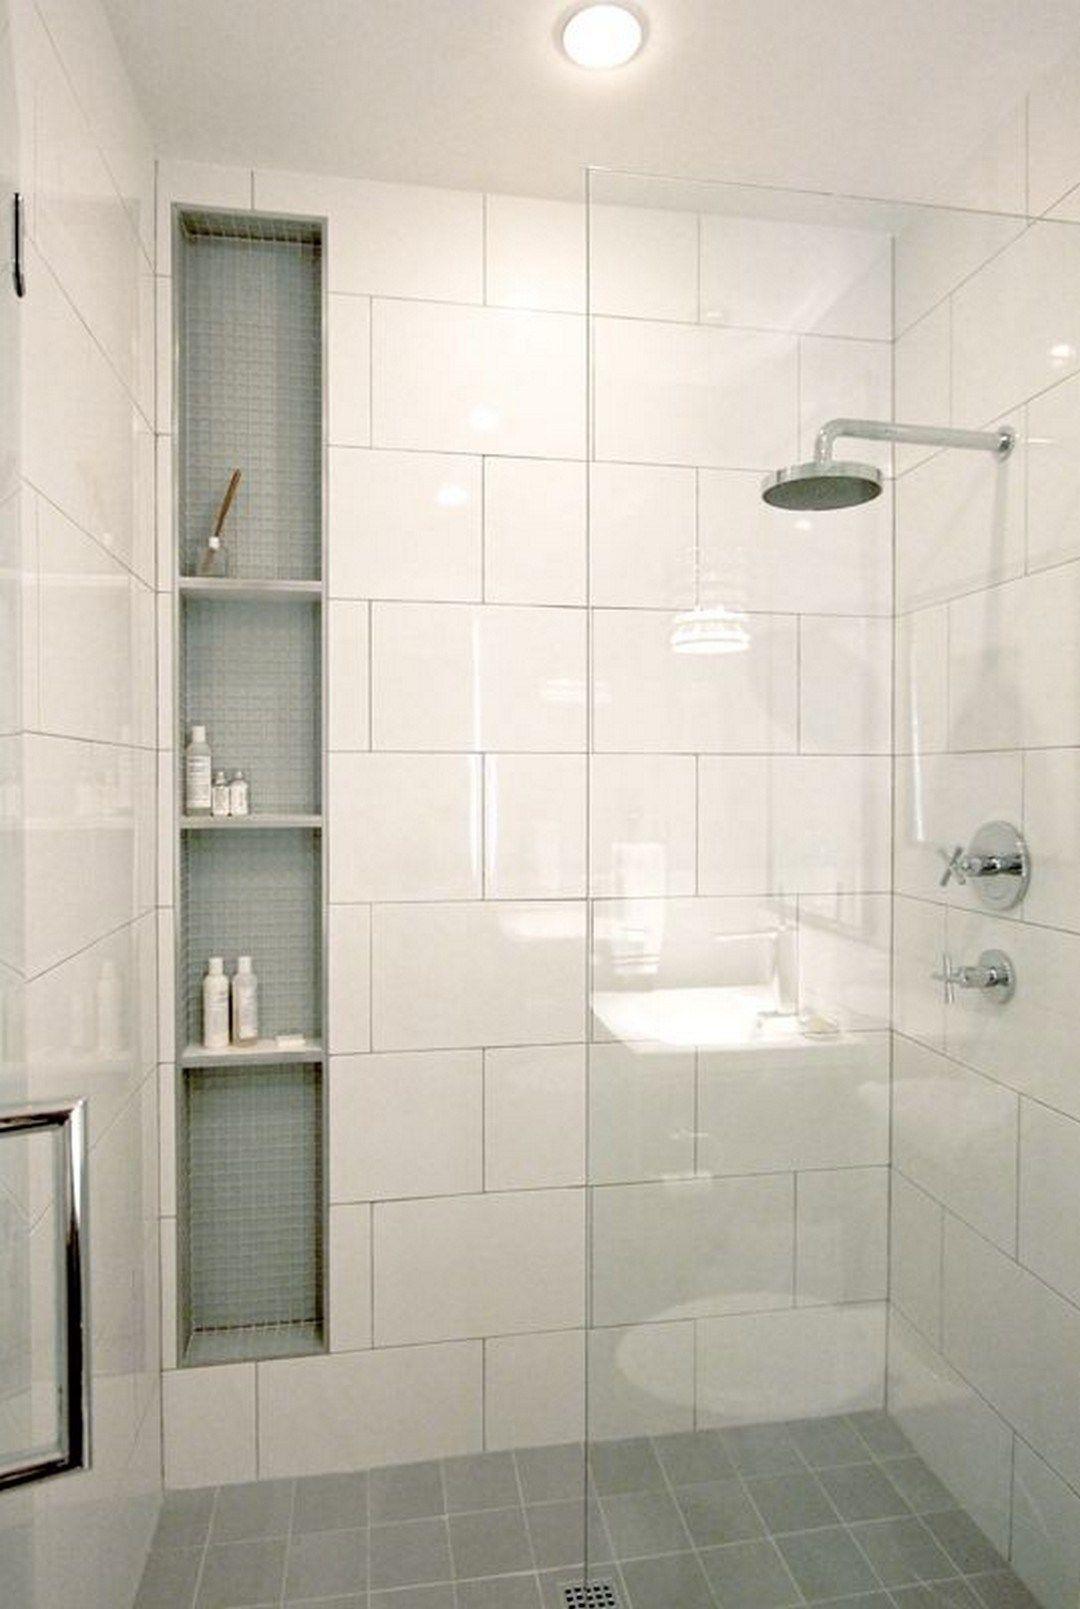 Small Master Bathroom Makeover Ideas On A Budget - Bathroom shower makeovers on a budget